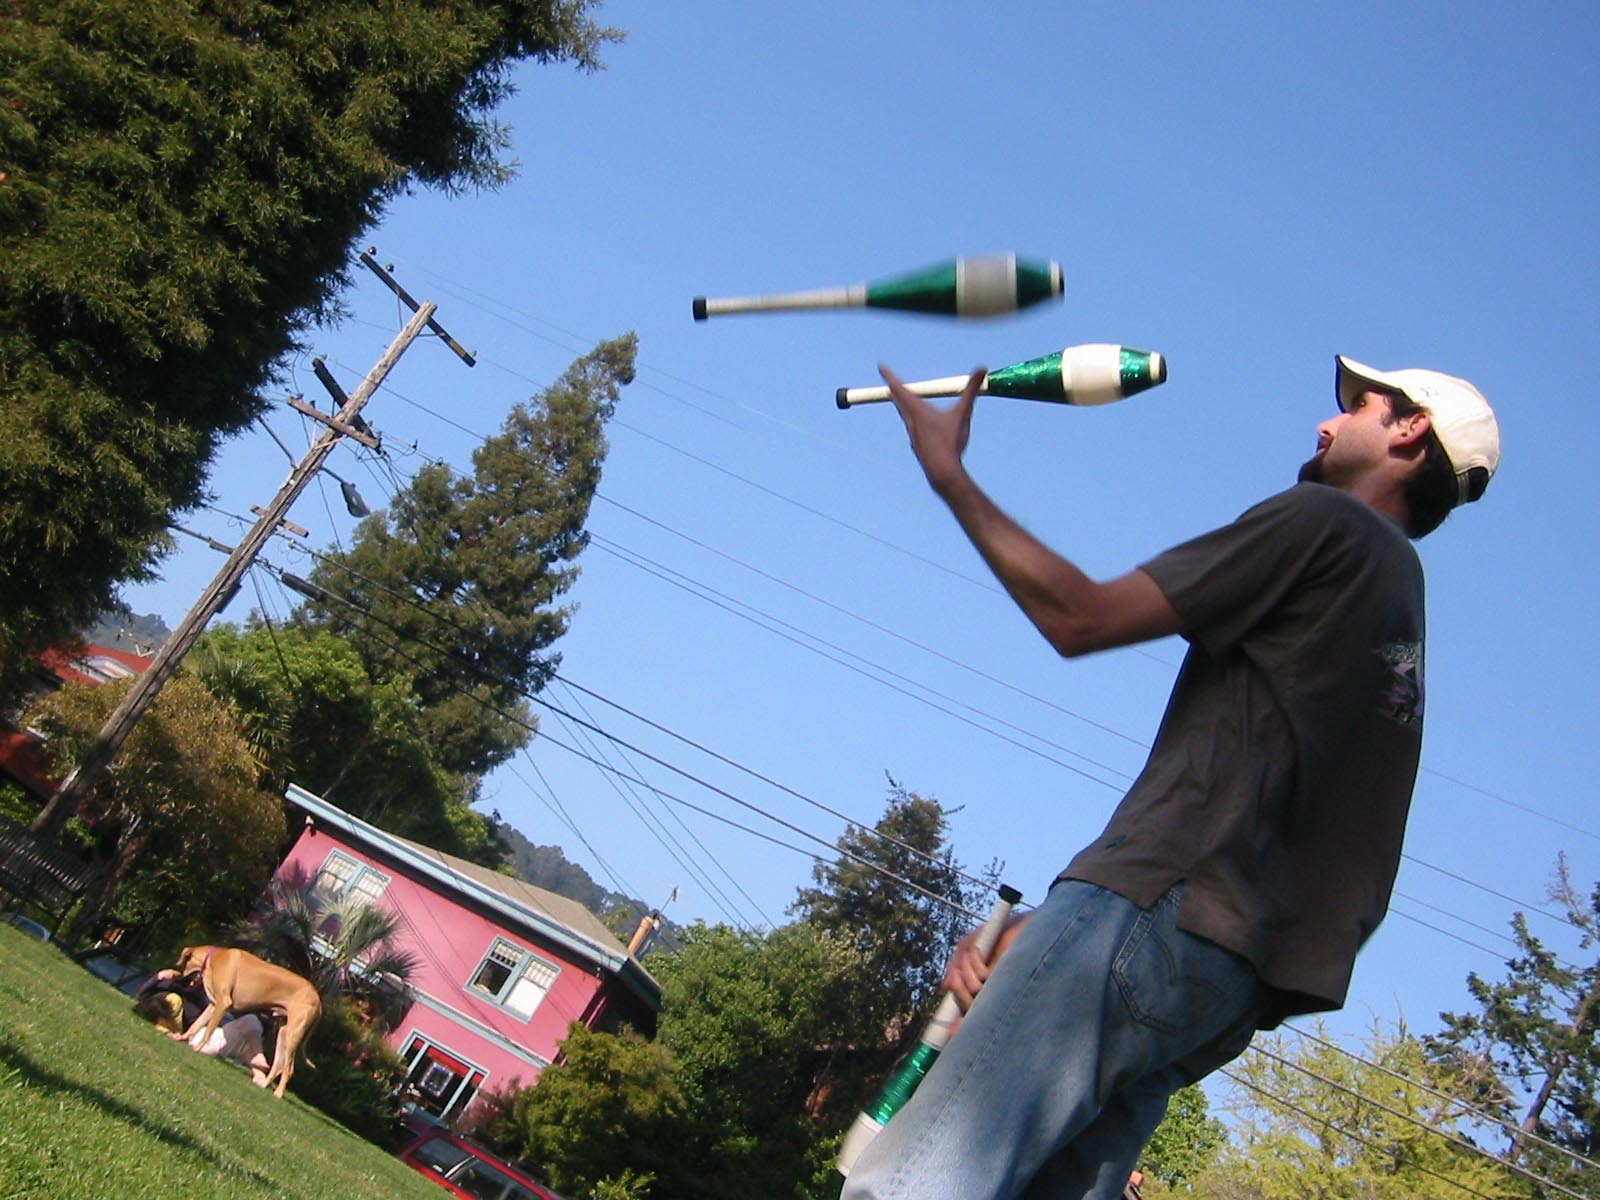 jugglers04